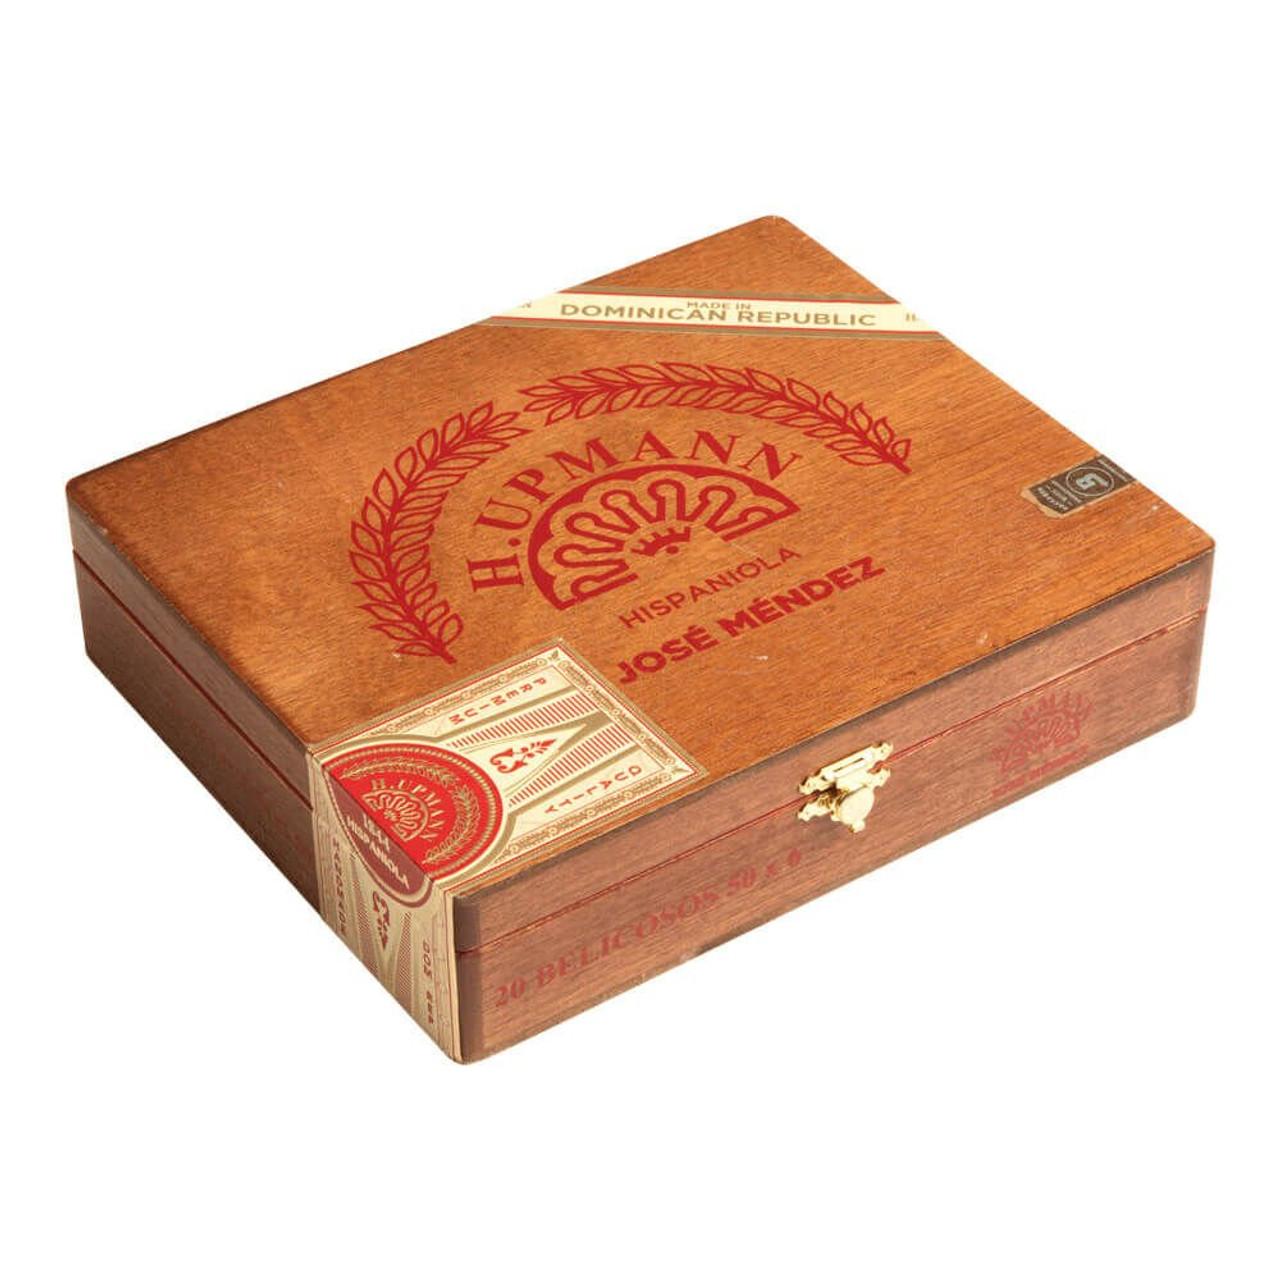 H. Upmann Hispaniola By Jose Mendez Robusto Cigars - 5 x 50 (Box of 20)